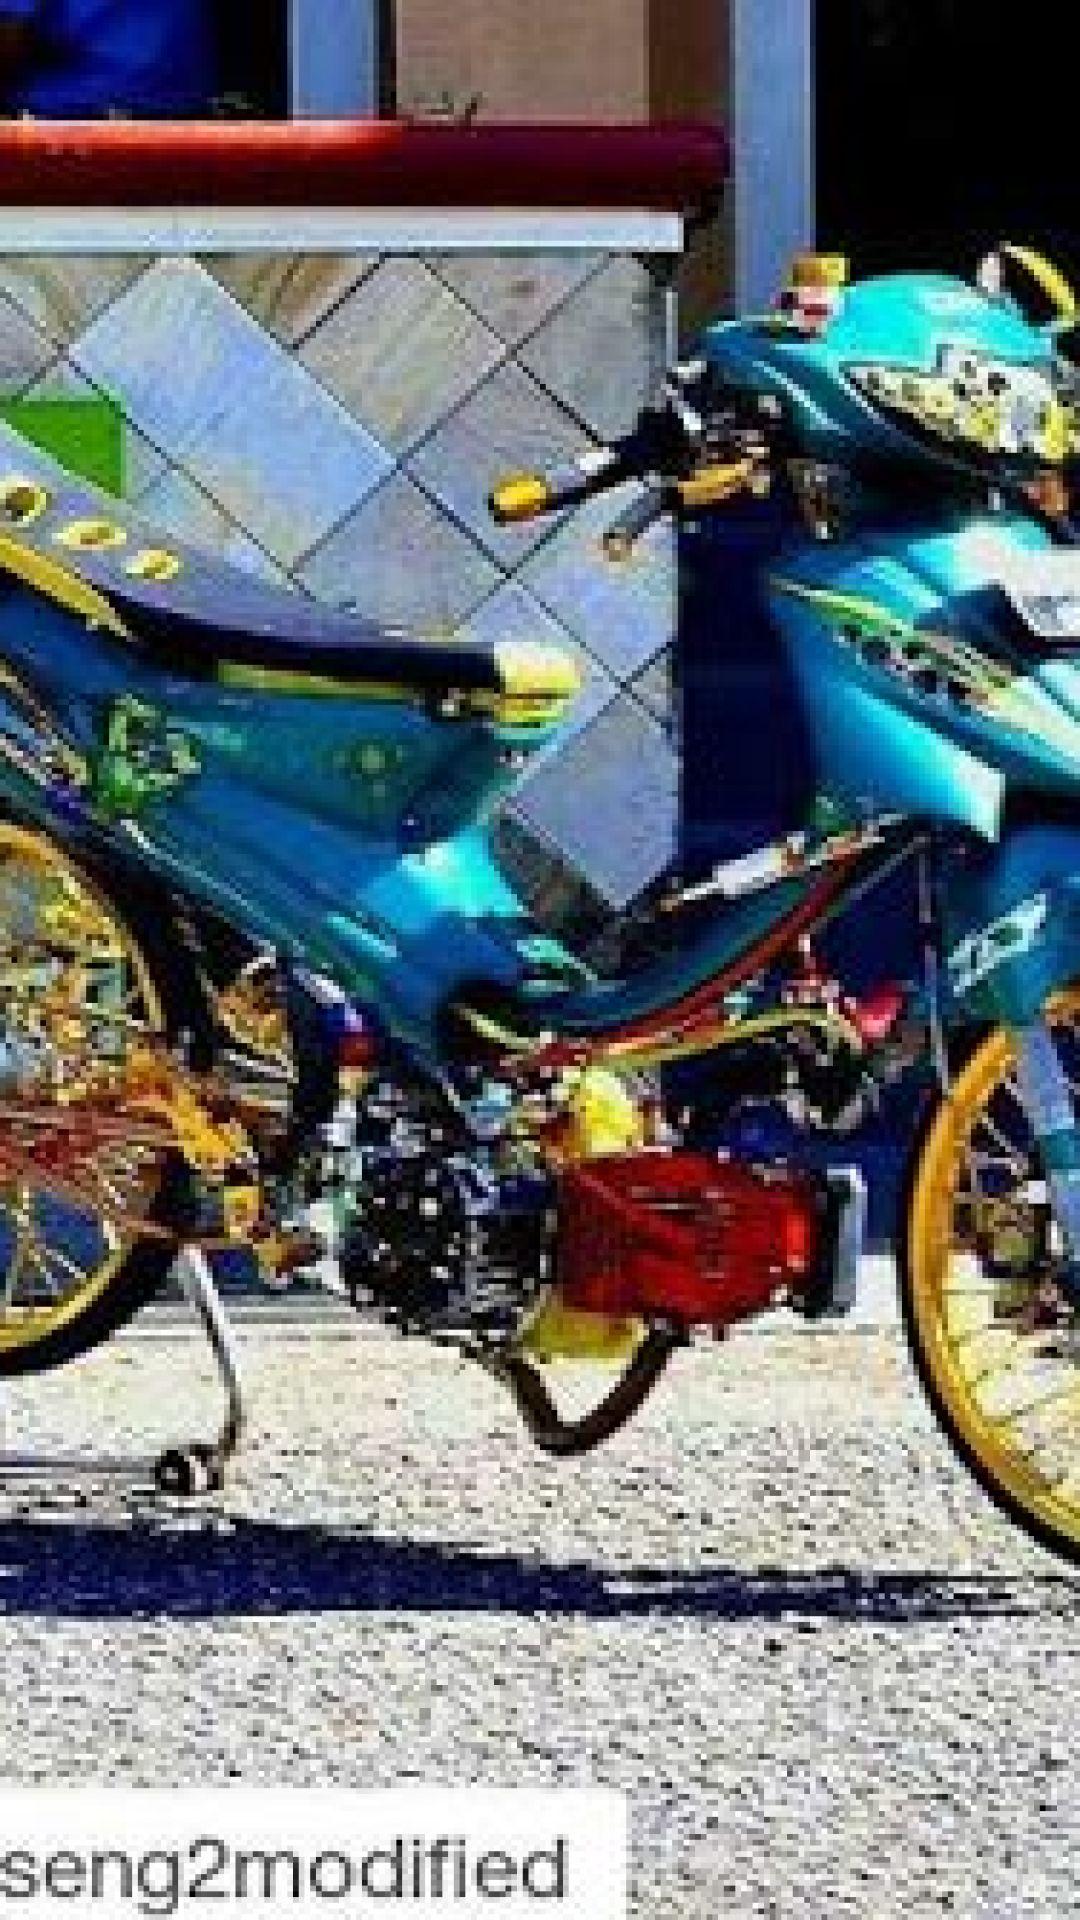 Modif Motor Smash 2004 : modif, motor, smash, Modifikasi, Motor, Suzuki, Smash, Terkeren, Oneng, Motomania